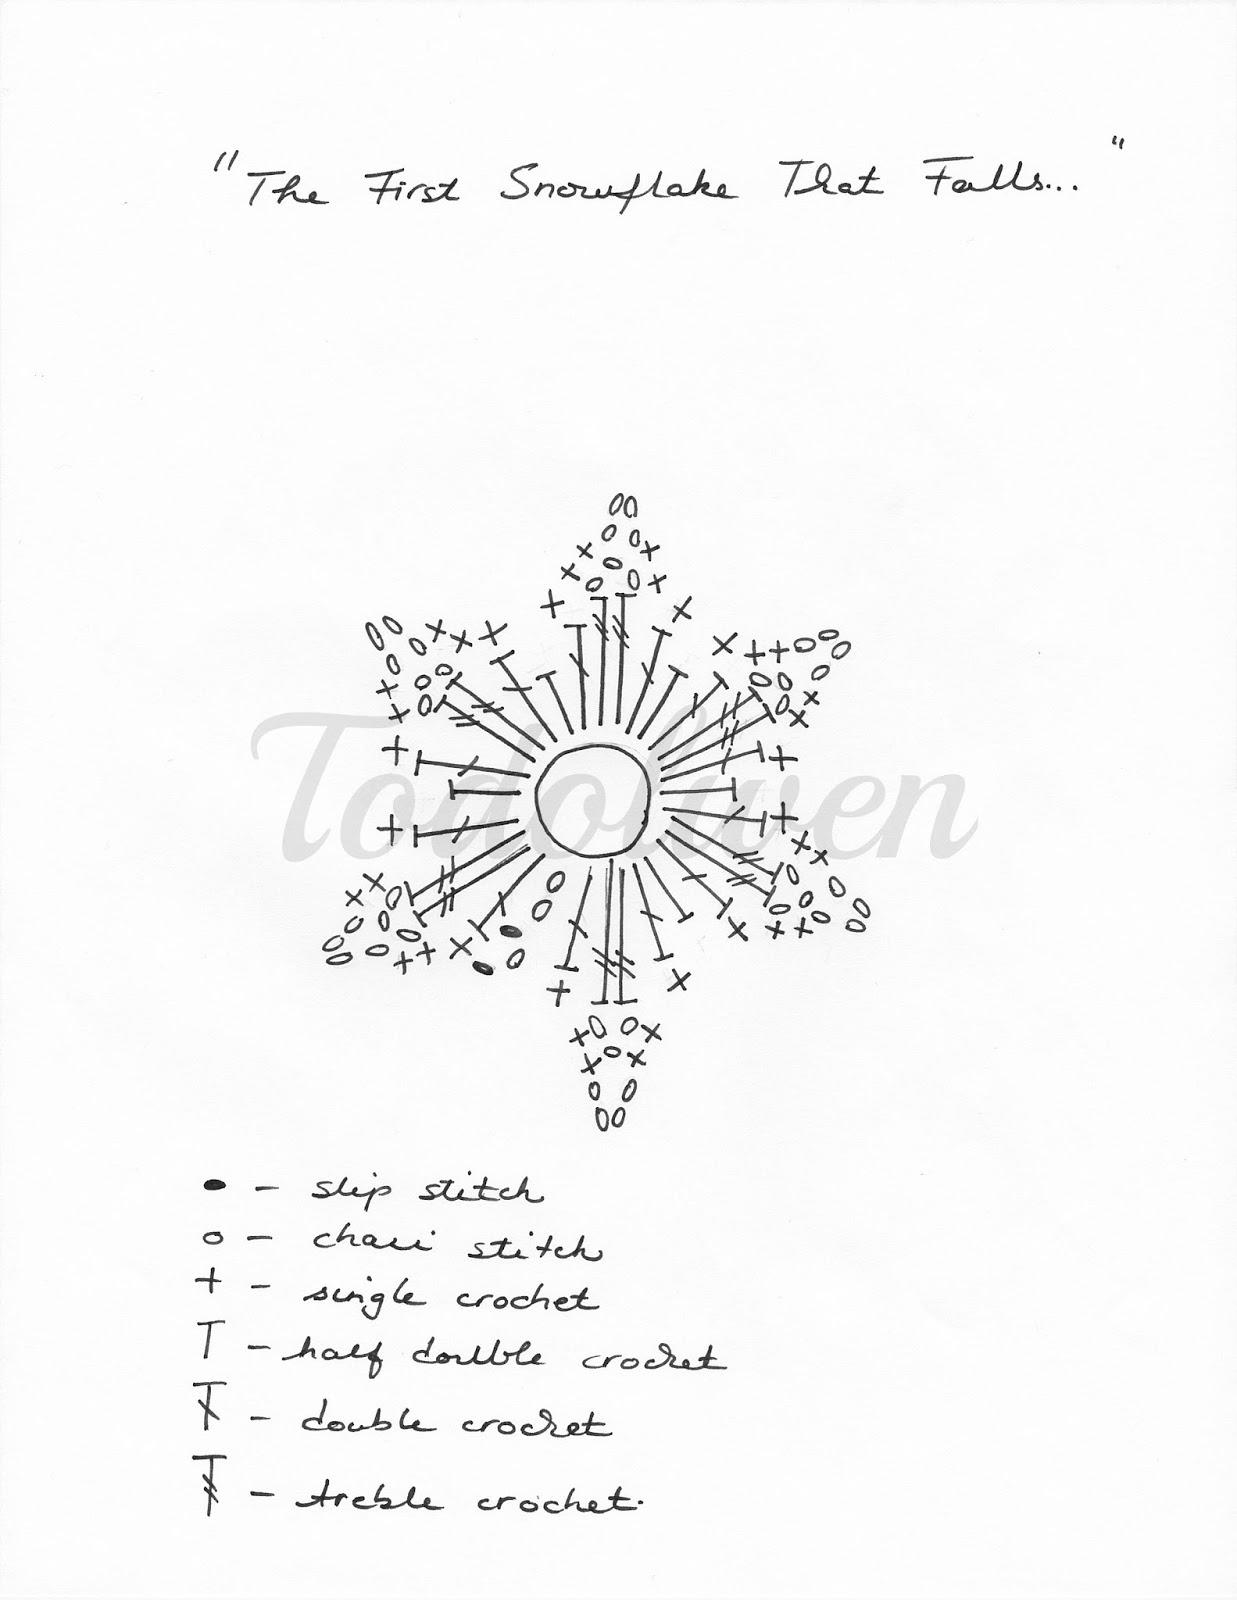 Drawn snowflake small FmdIyND4Qk0/VAvariwovJI/AAAAAAA com/ blogspot